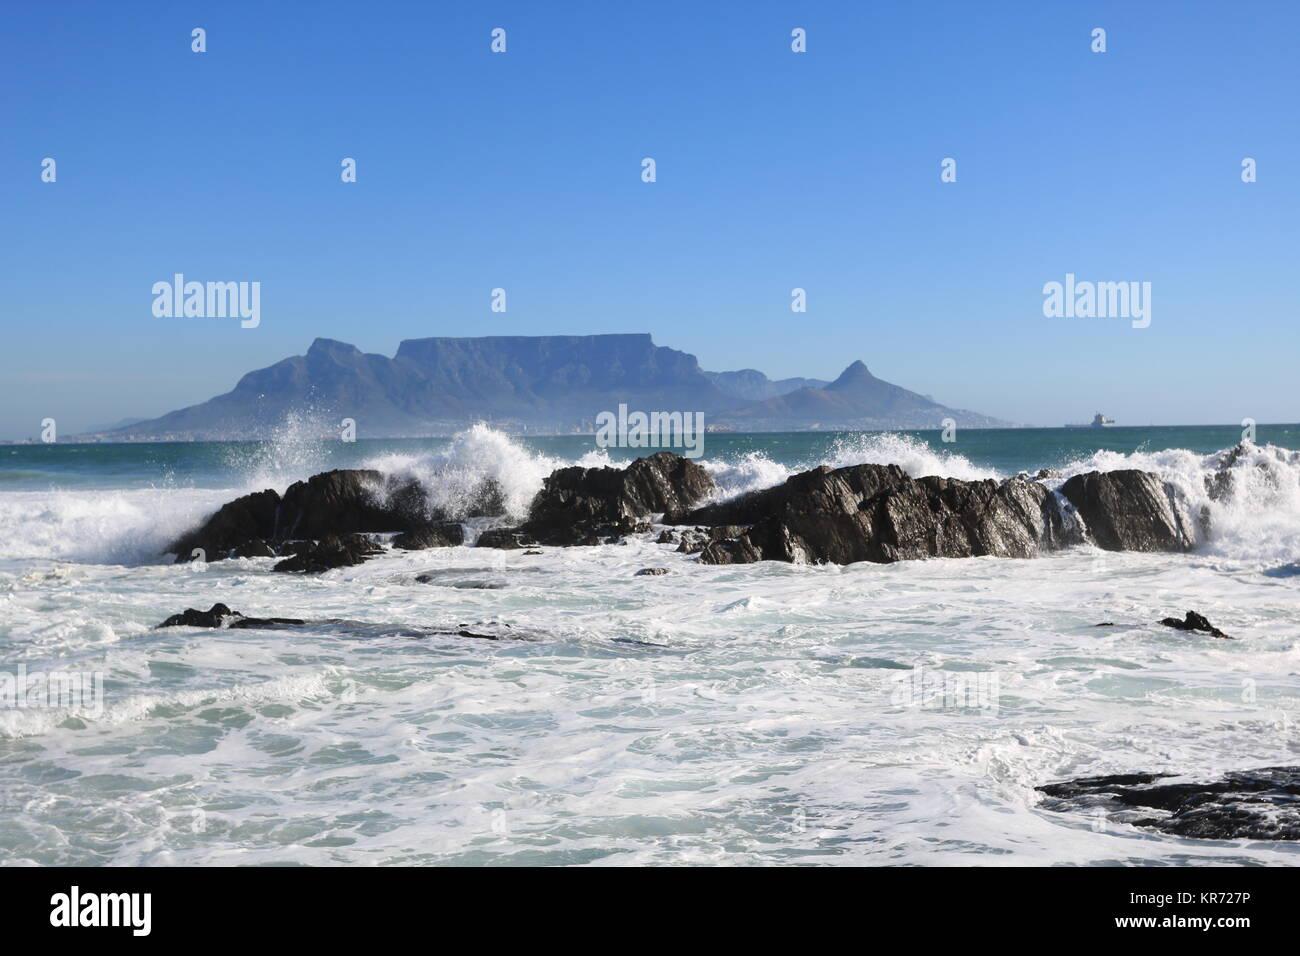 Cape Town South Africa Imagen De Stock